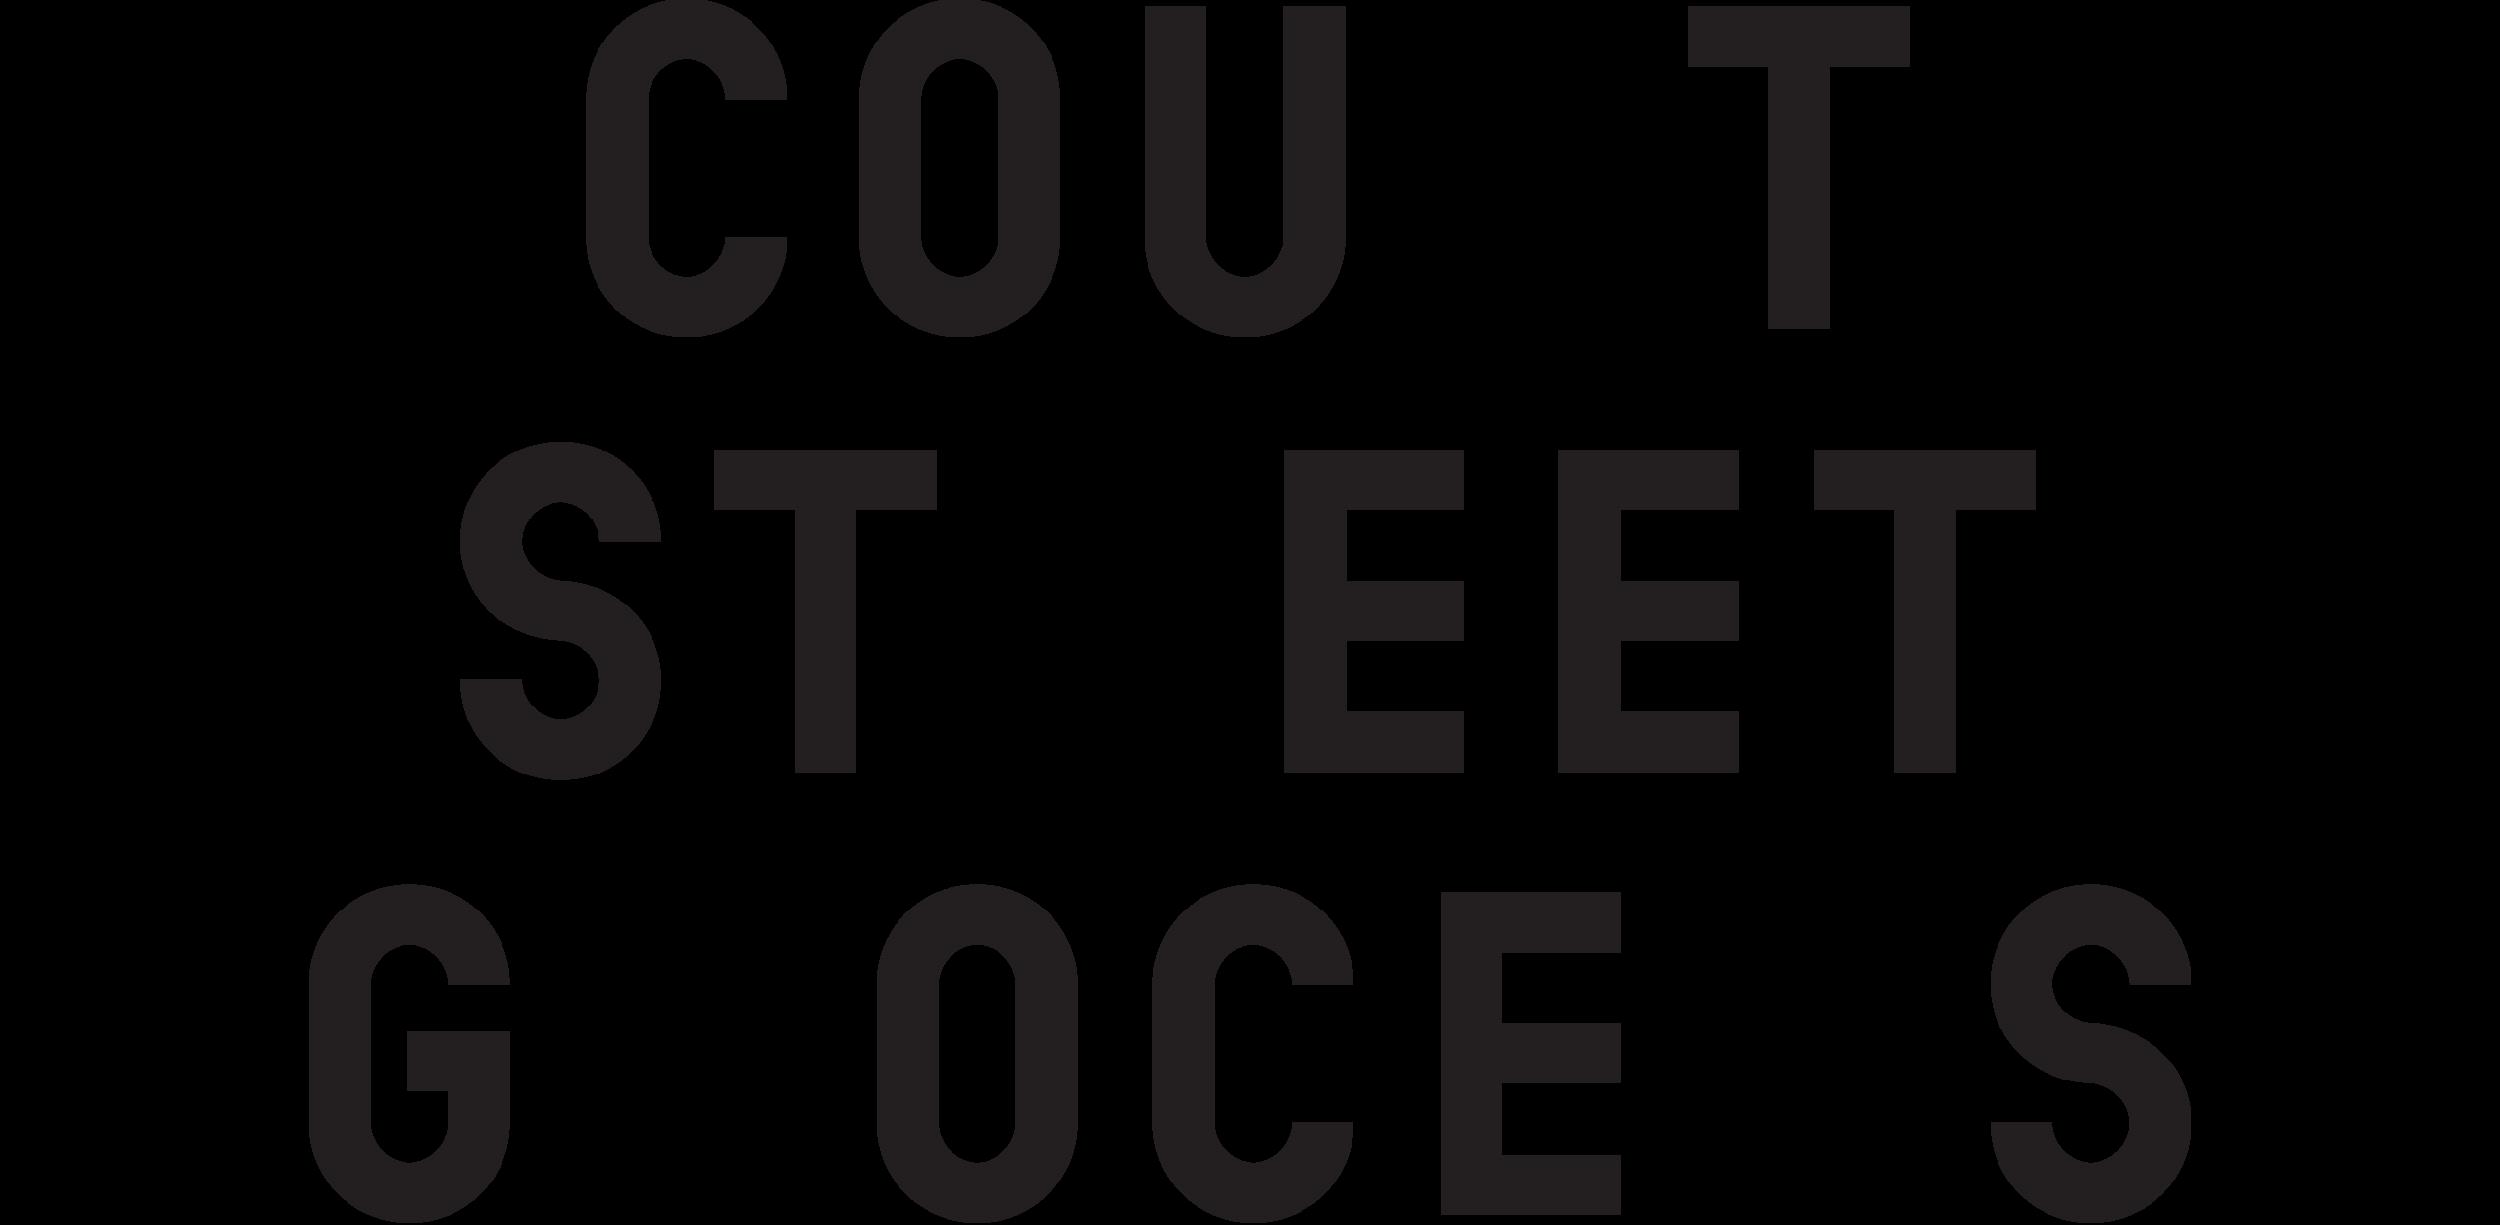 court street grocer logo.png